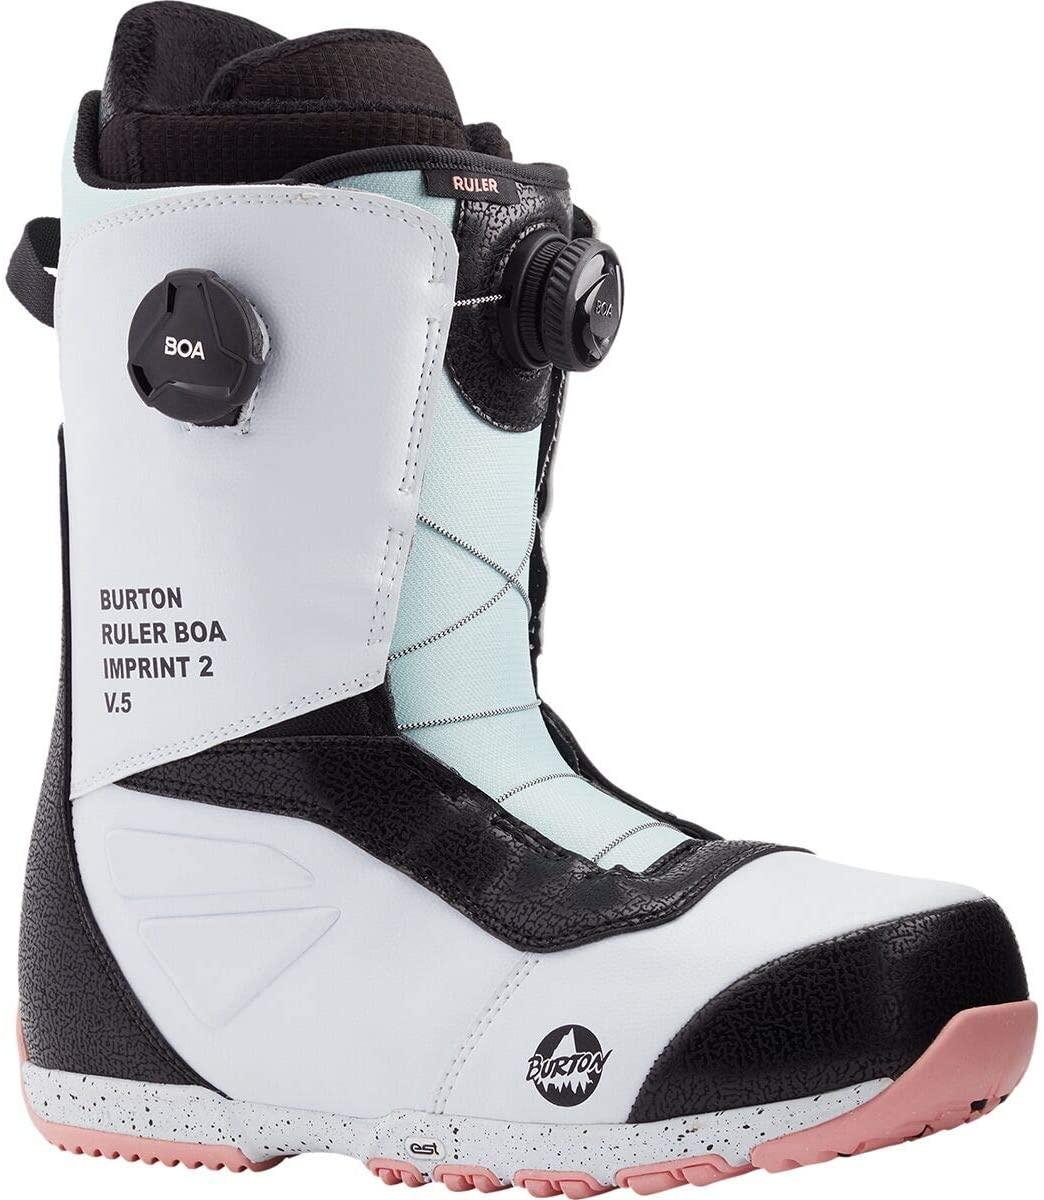 Burton Ruler Boa Snowboard Boot - Men's White/Black/Multi, 9.5